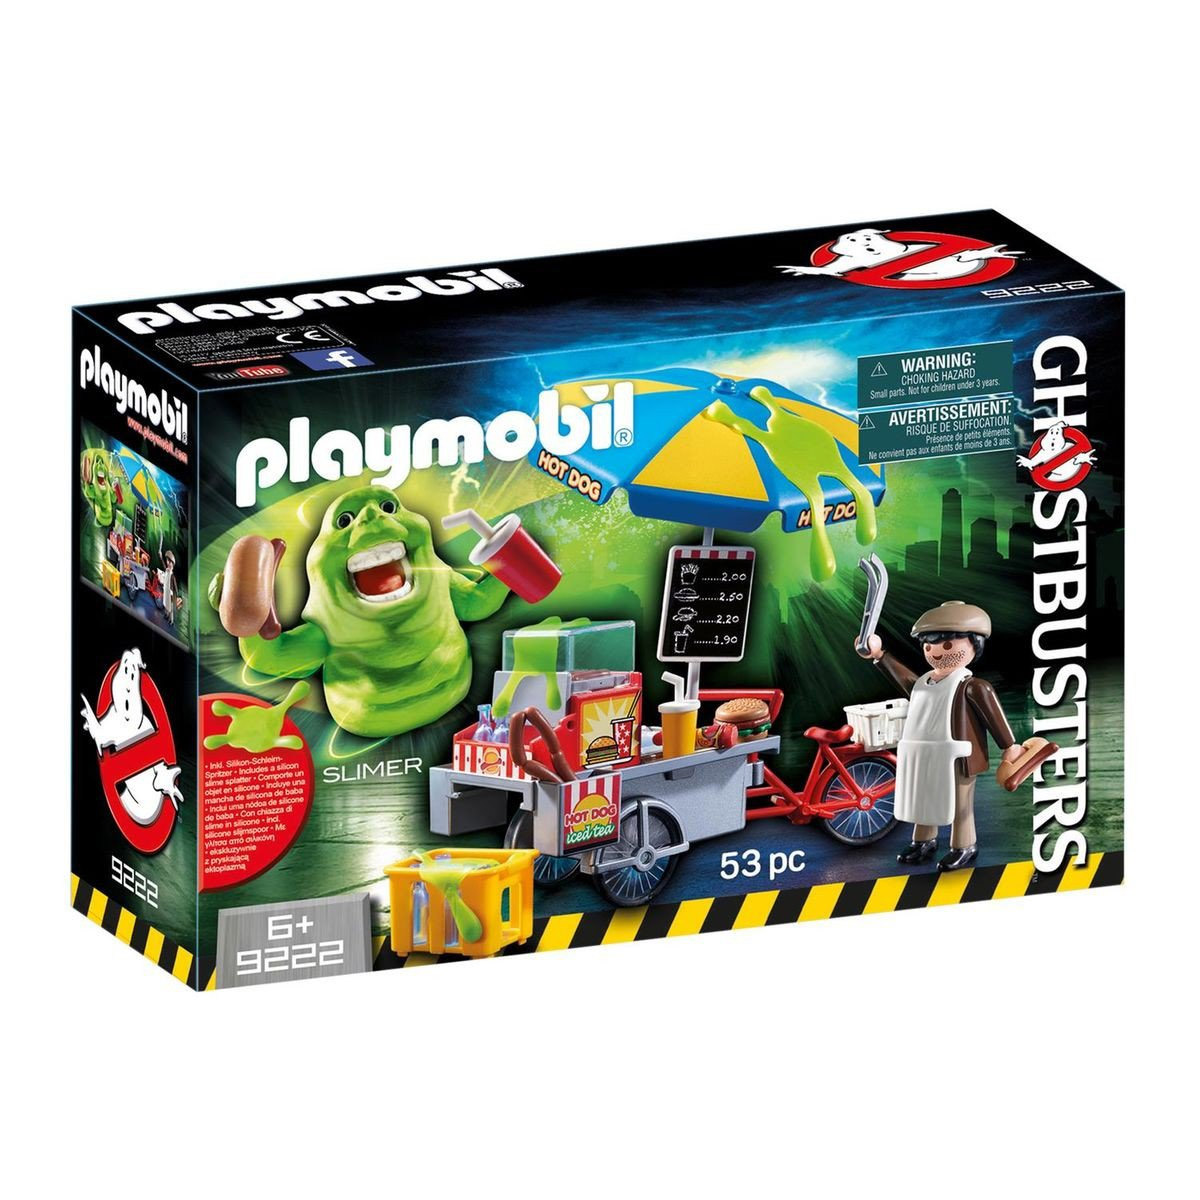 Playmobil 9222 : Ghostbusters - Bouffe-tout avec stand de hot-dog